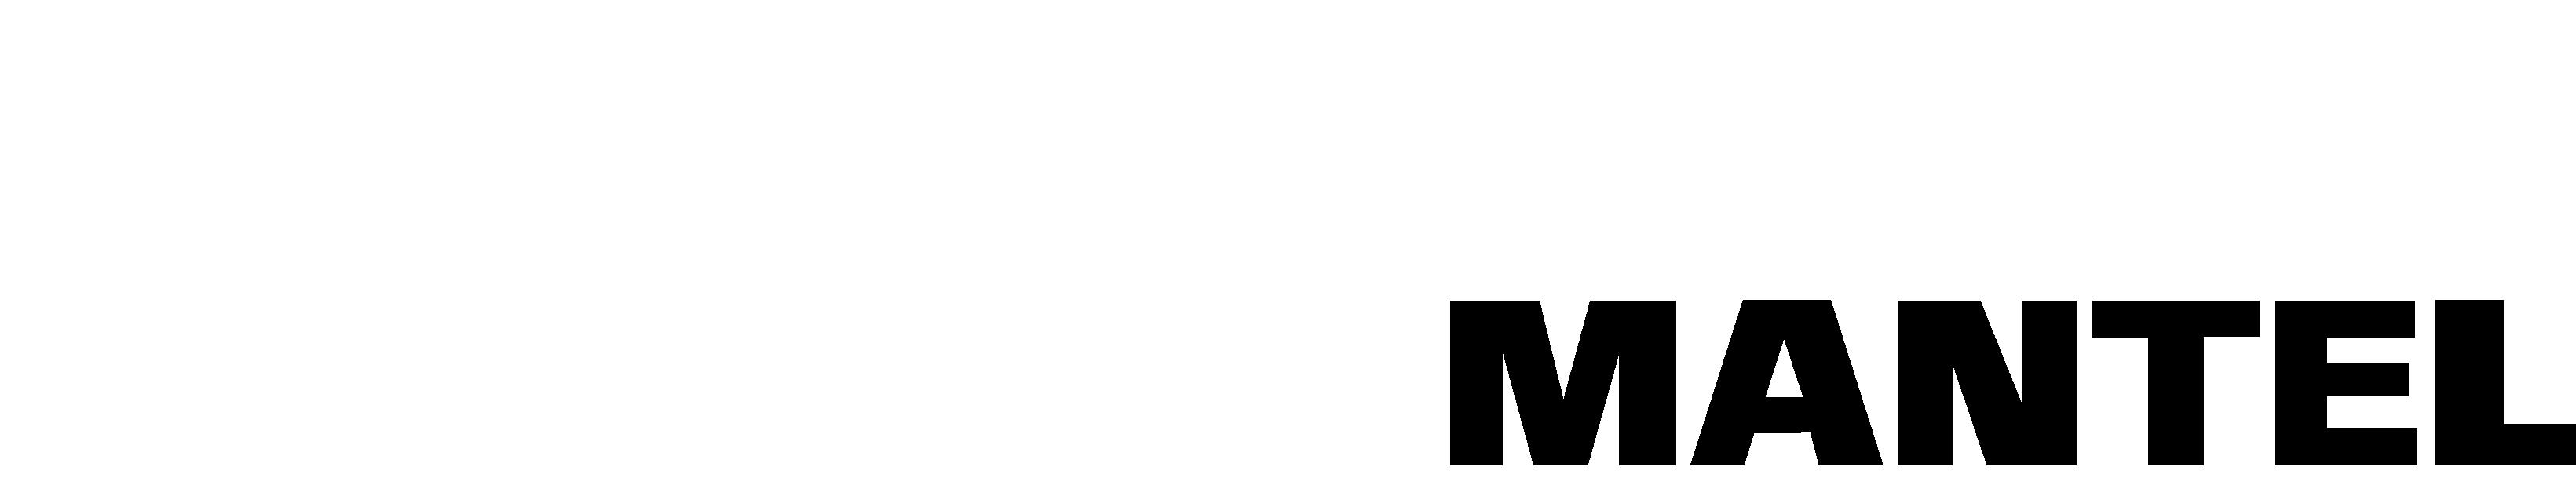 Carrosserie Mantel